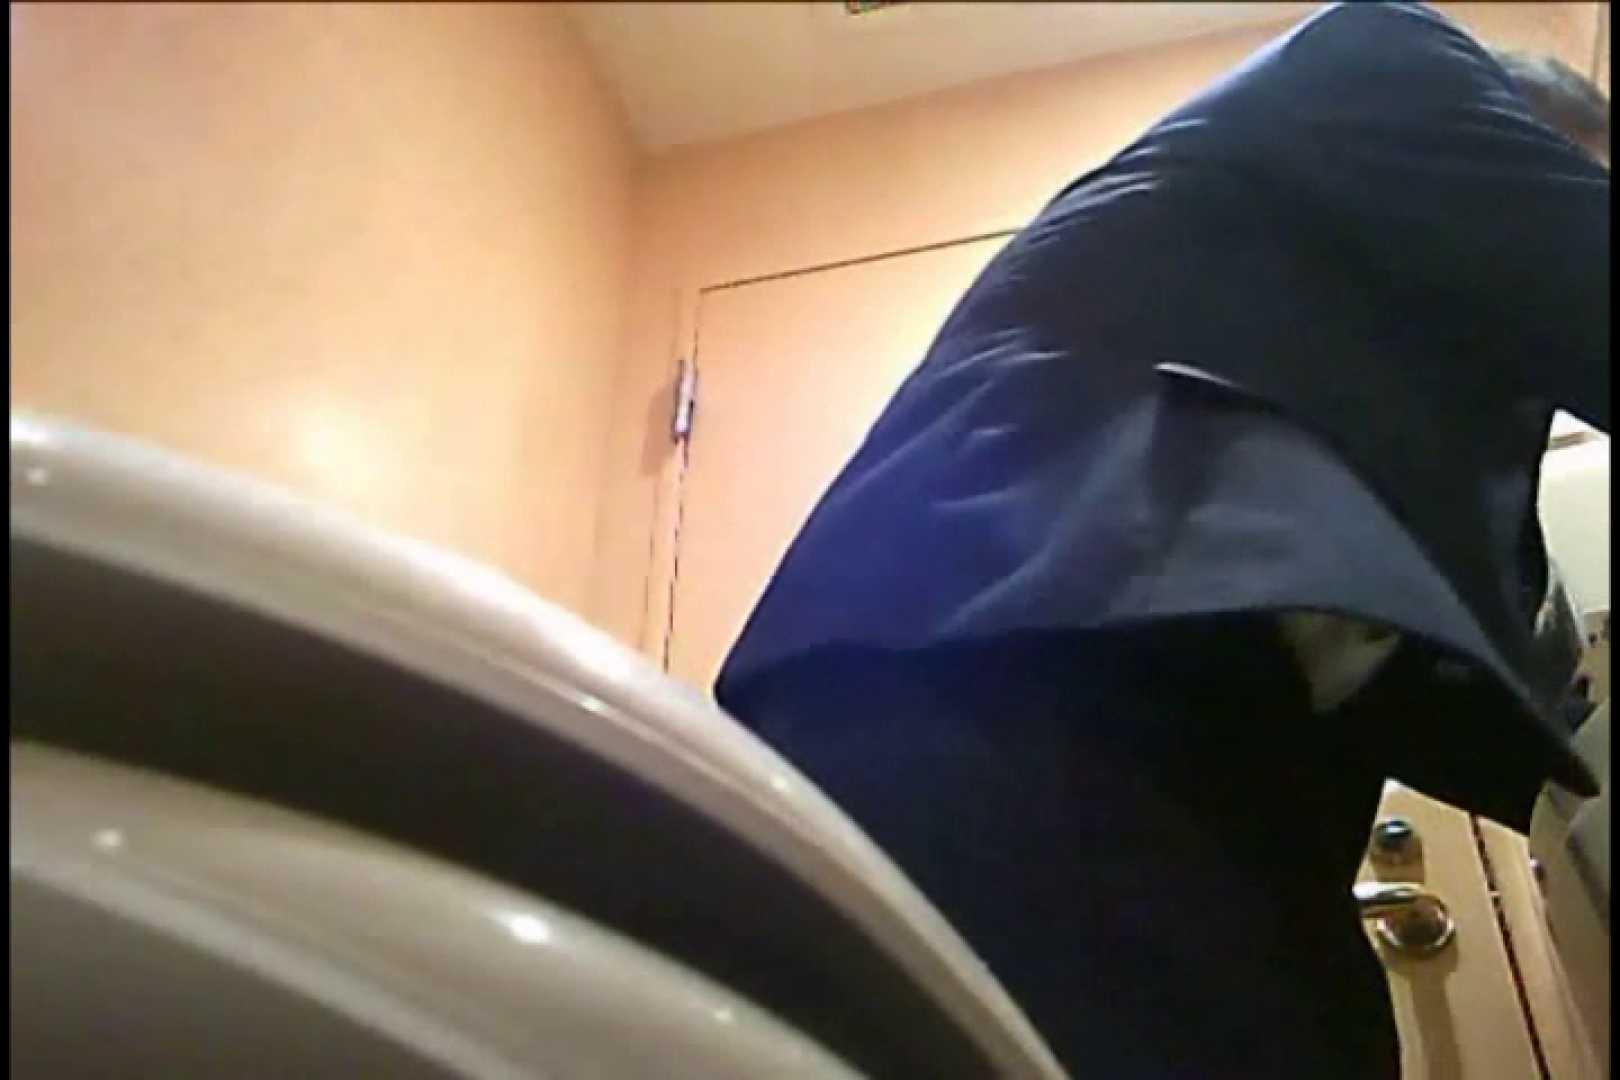 Gボーイ初投稿!掴み取りさんの洗面所覗き!in新幹線!VOL.05 リーマン系な男たち ゲイ流出動画キャプチャ 63連発 29